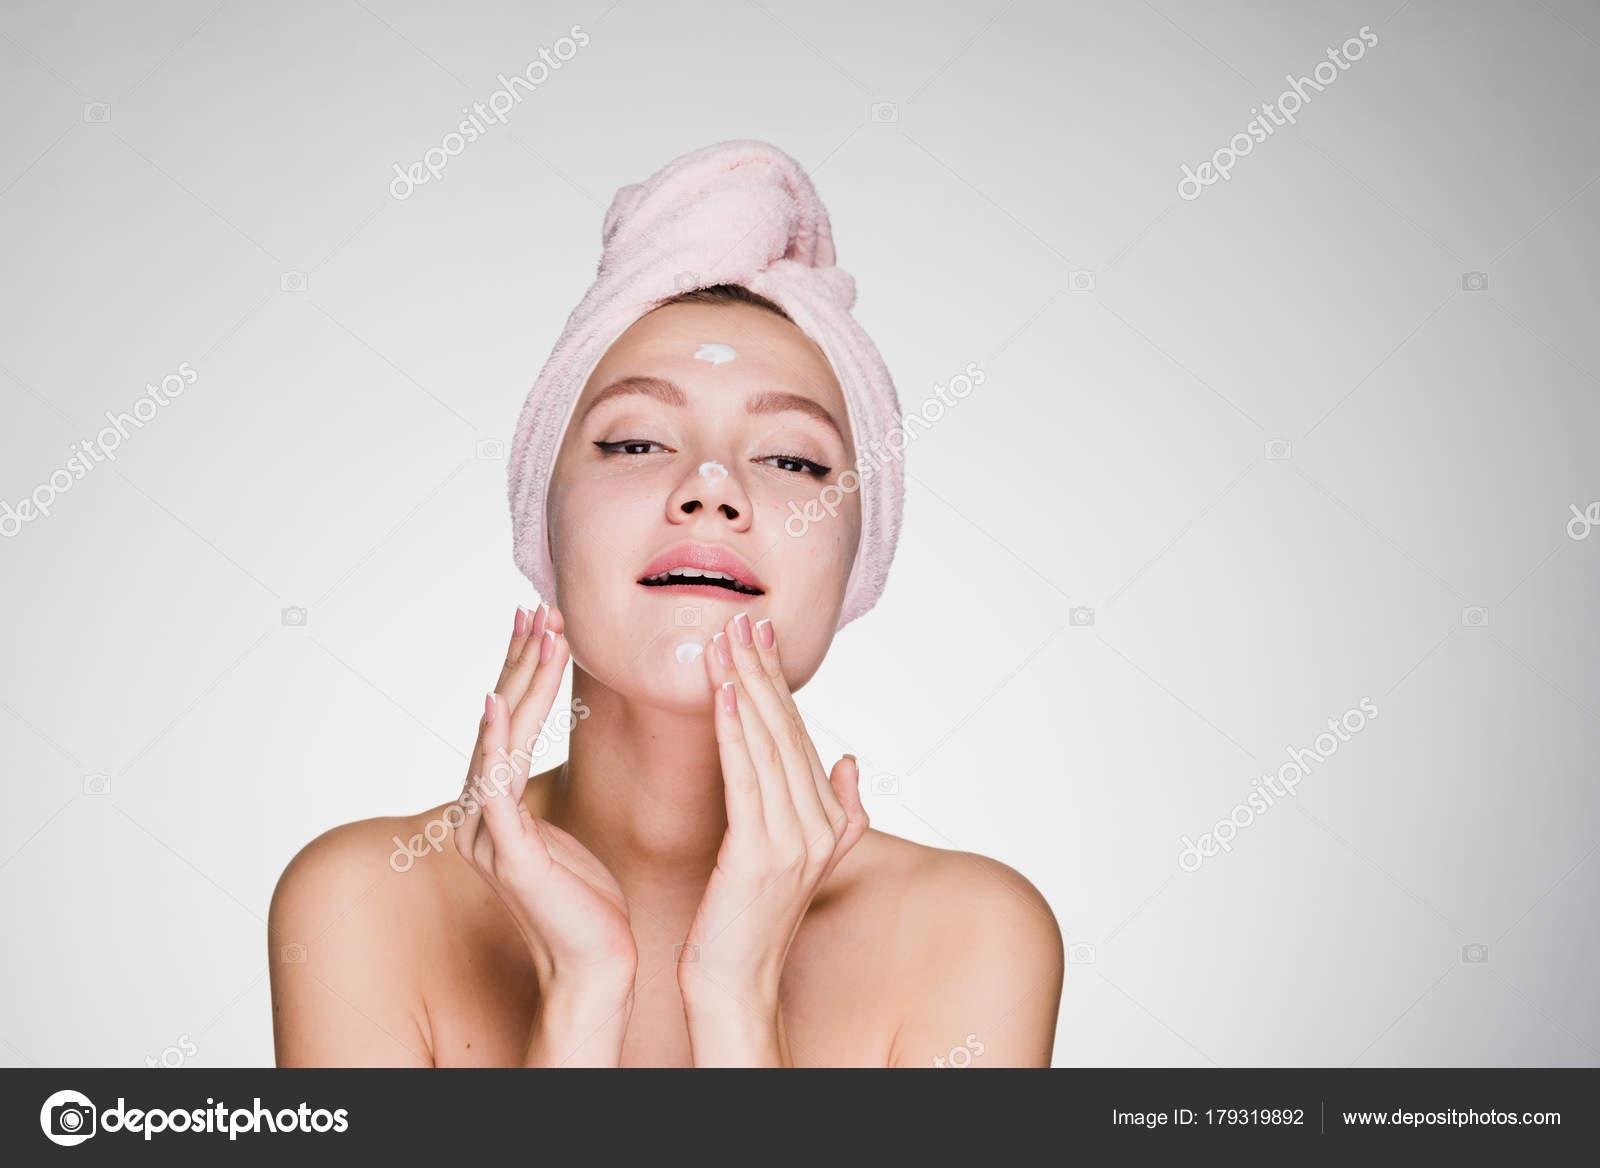 chewing gum perdere peso faccia